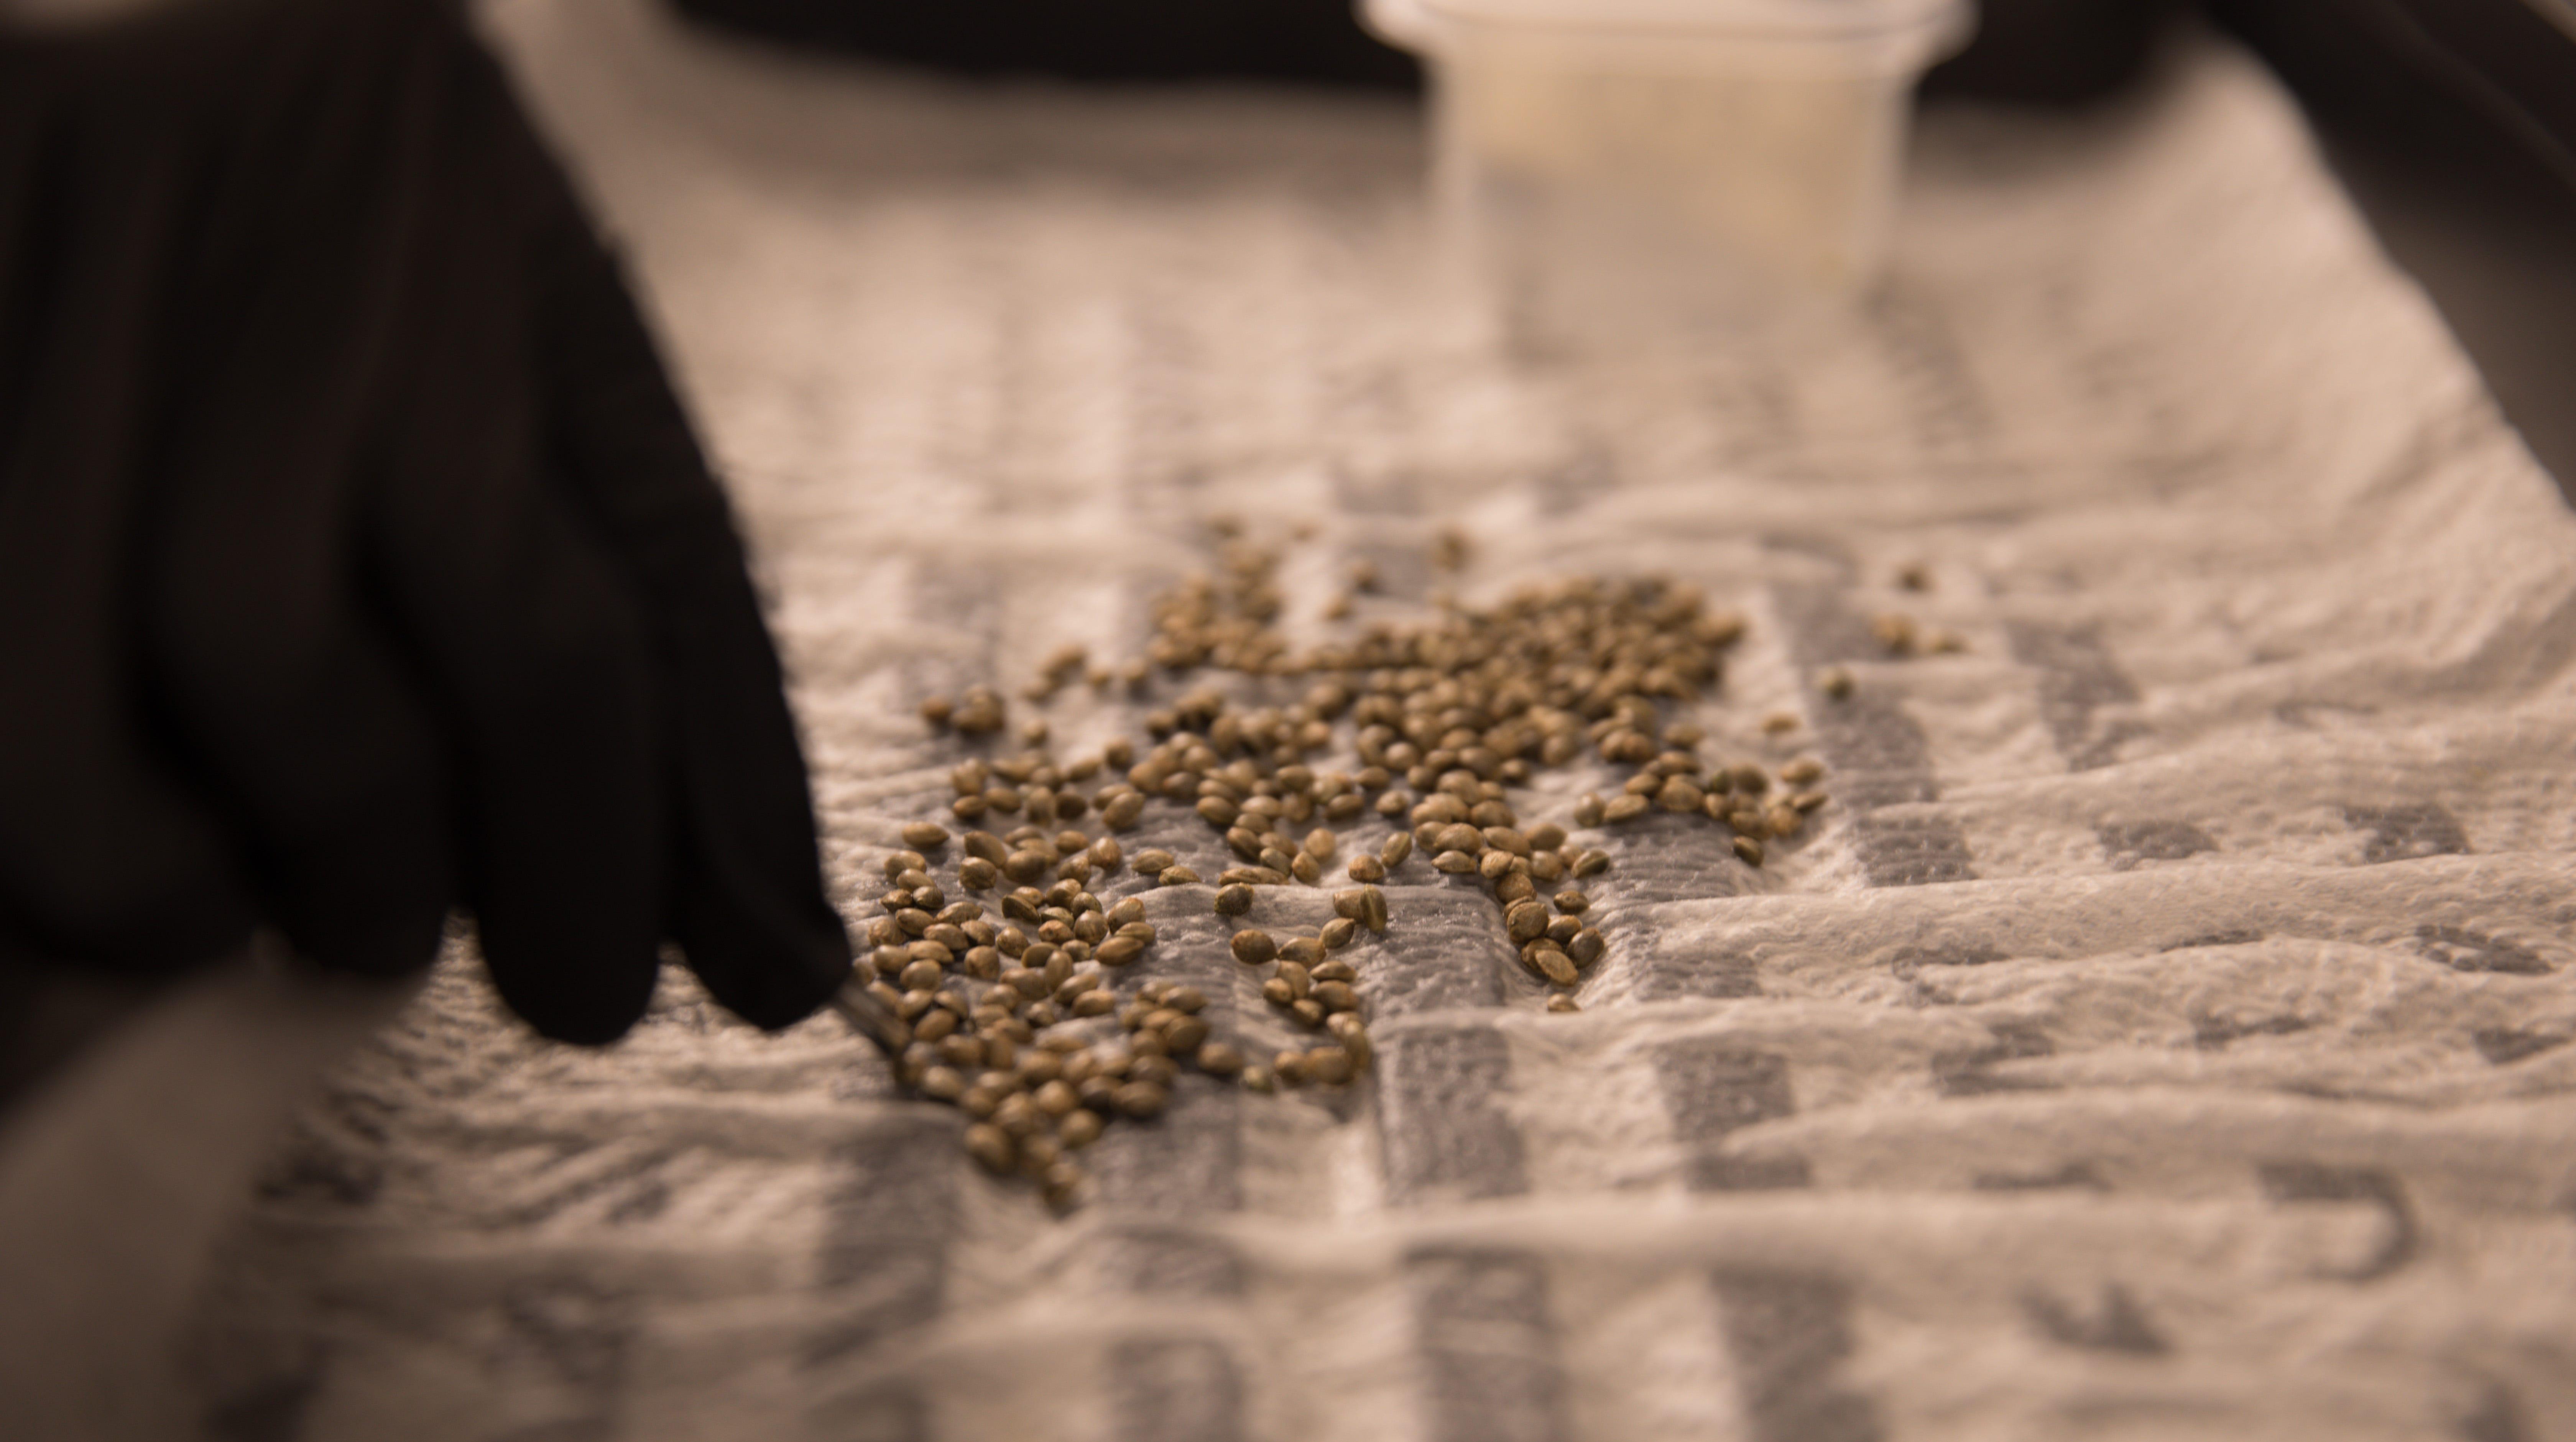 Medical marijuana in Ohio: Take a peek at first seeds planted